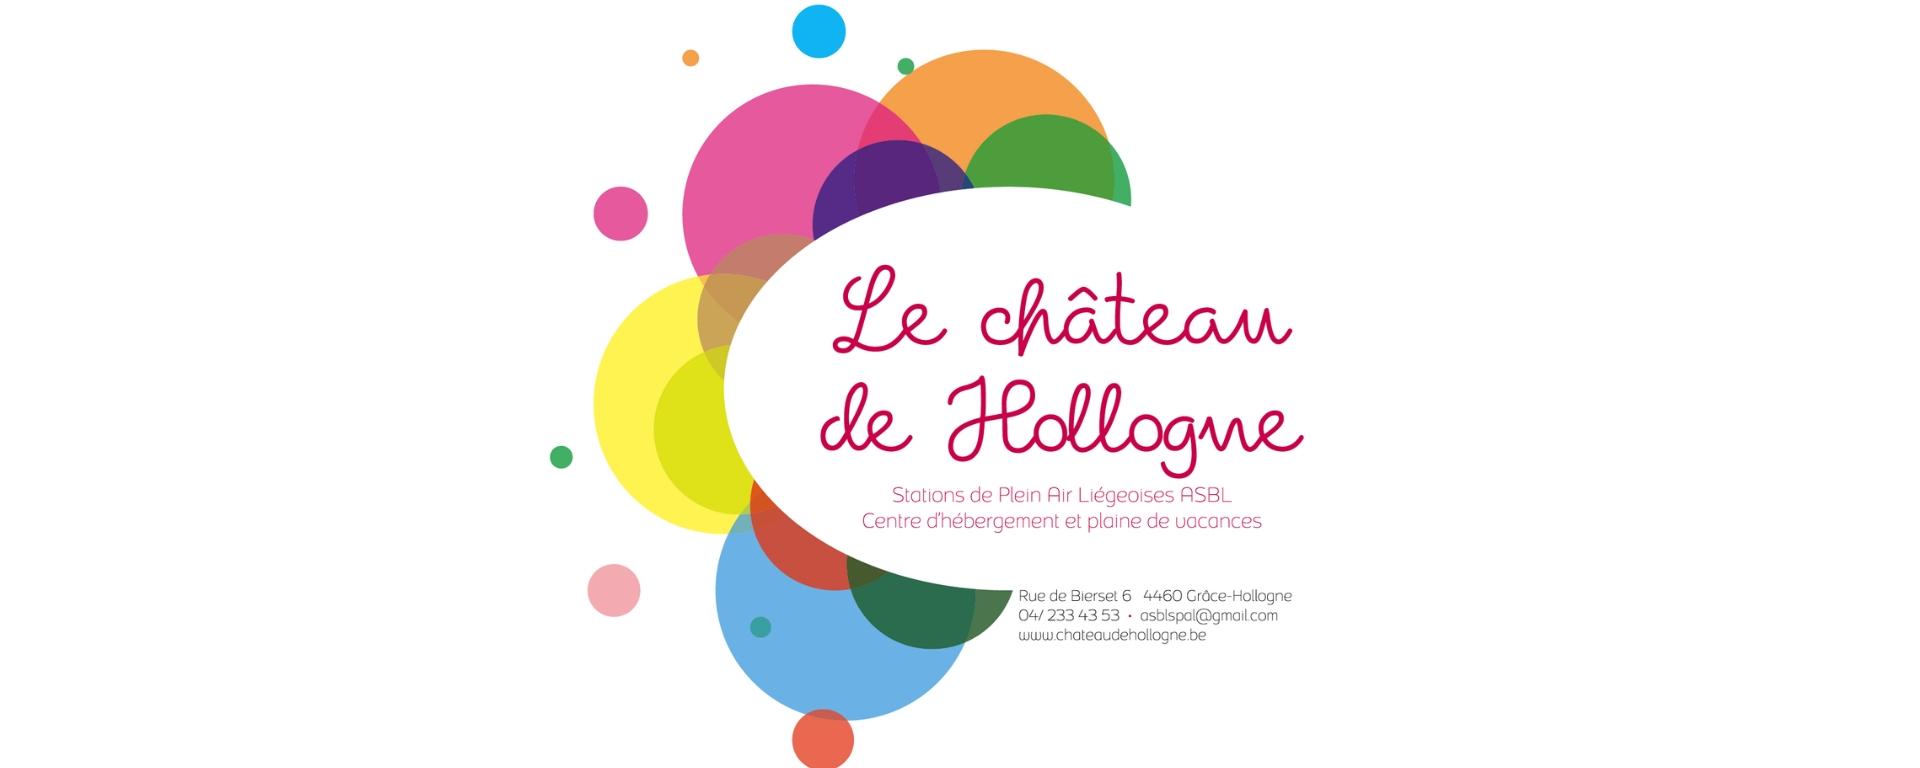 Château de Hollogne Logo